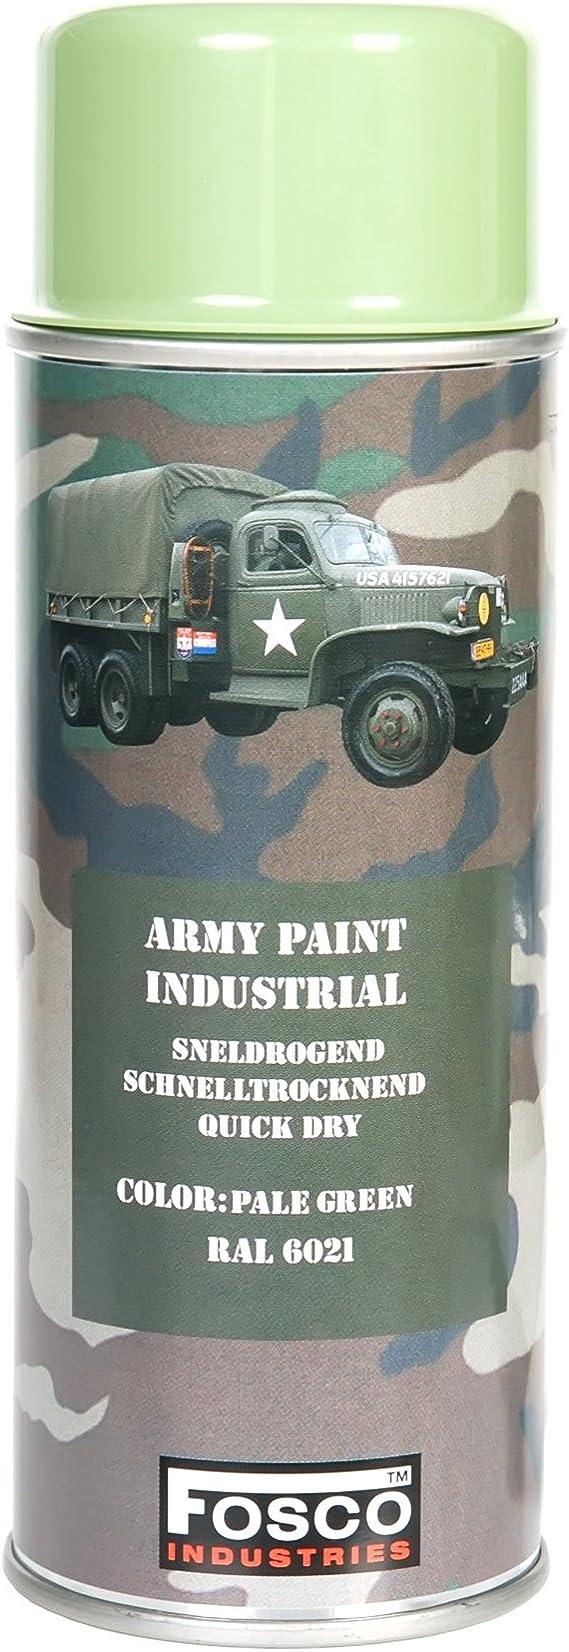 Monstercolors Farbmarker Stift Army 400 Ml Spray Farbe Hell Grün Ral 6021 Militärfahrzeuge Paint Paintball Camo Küche Haushalt